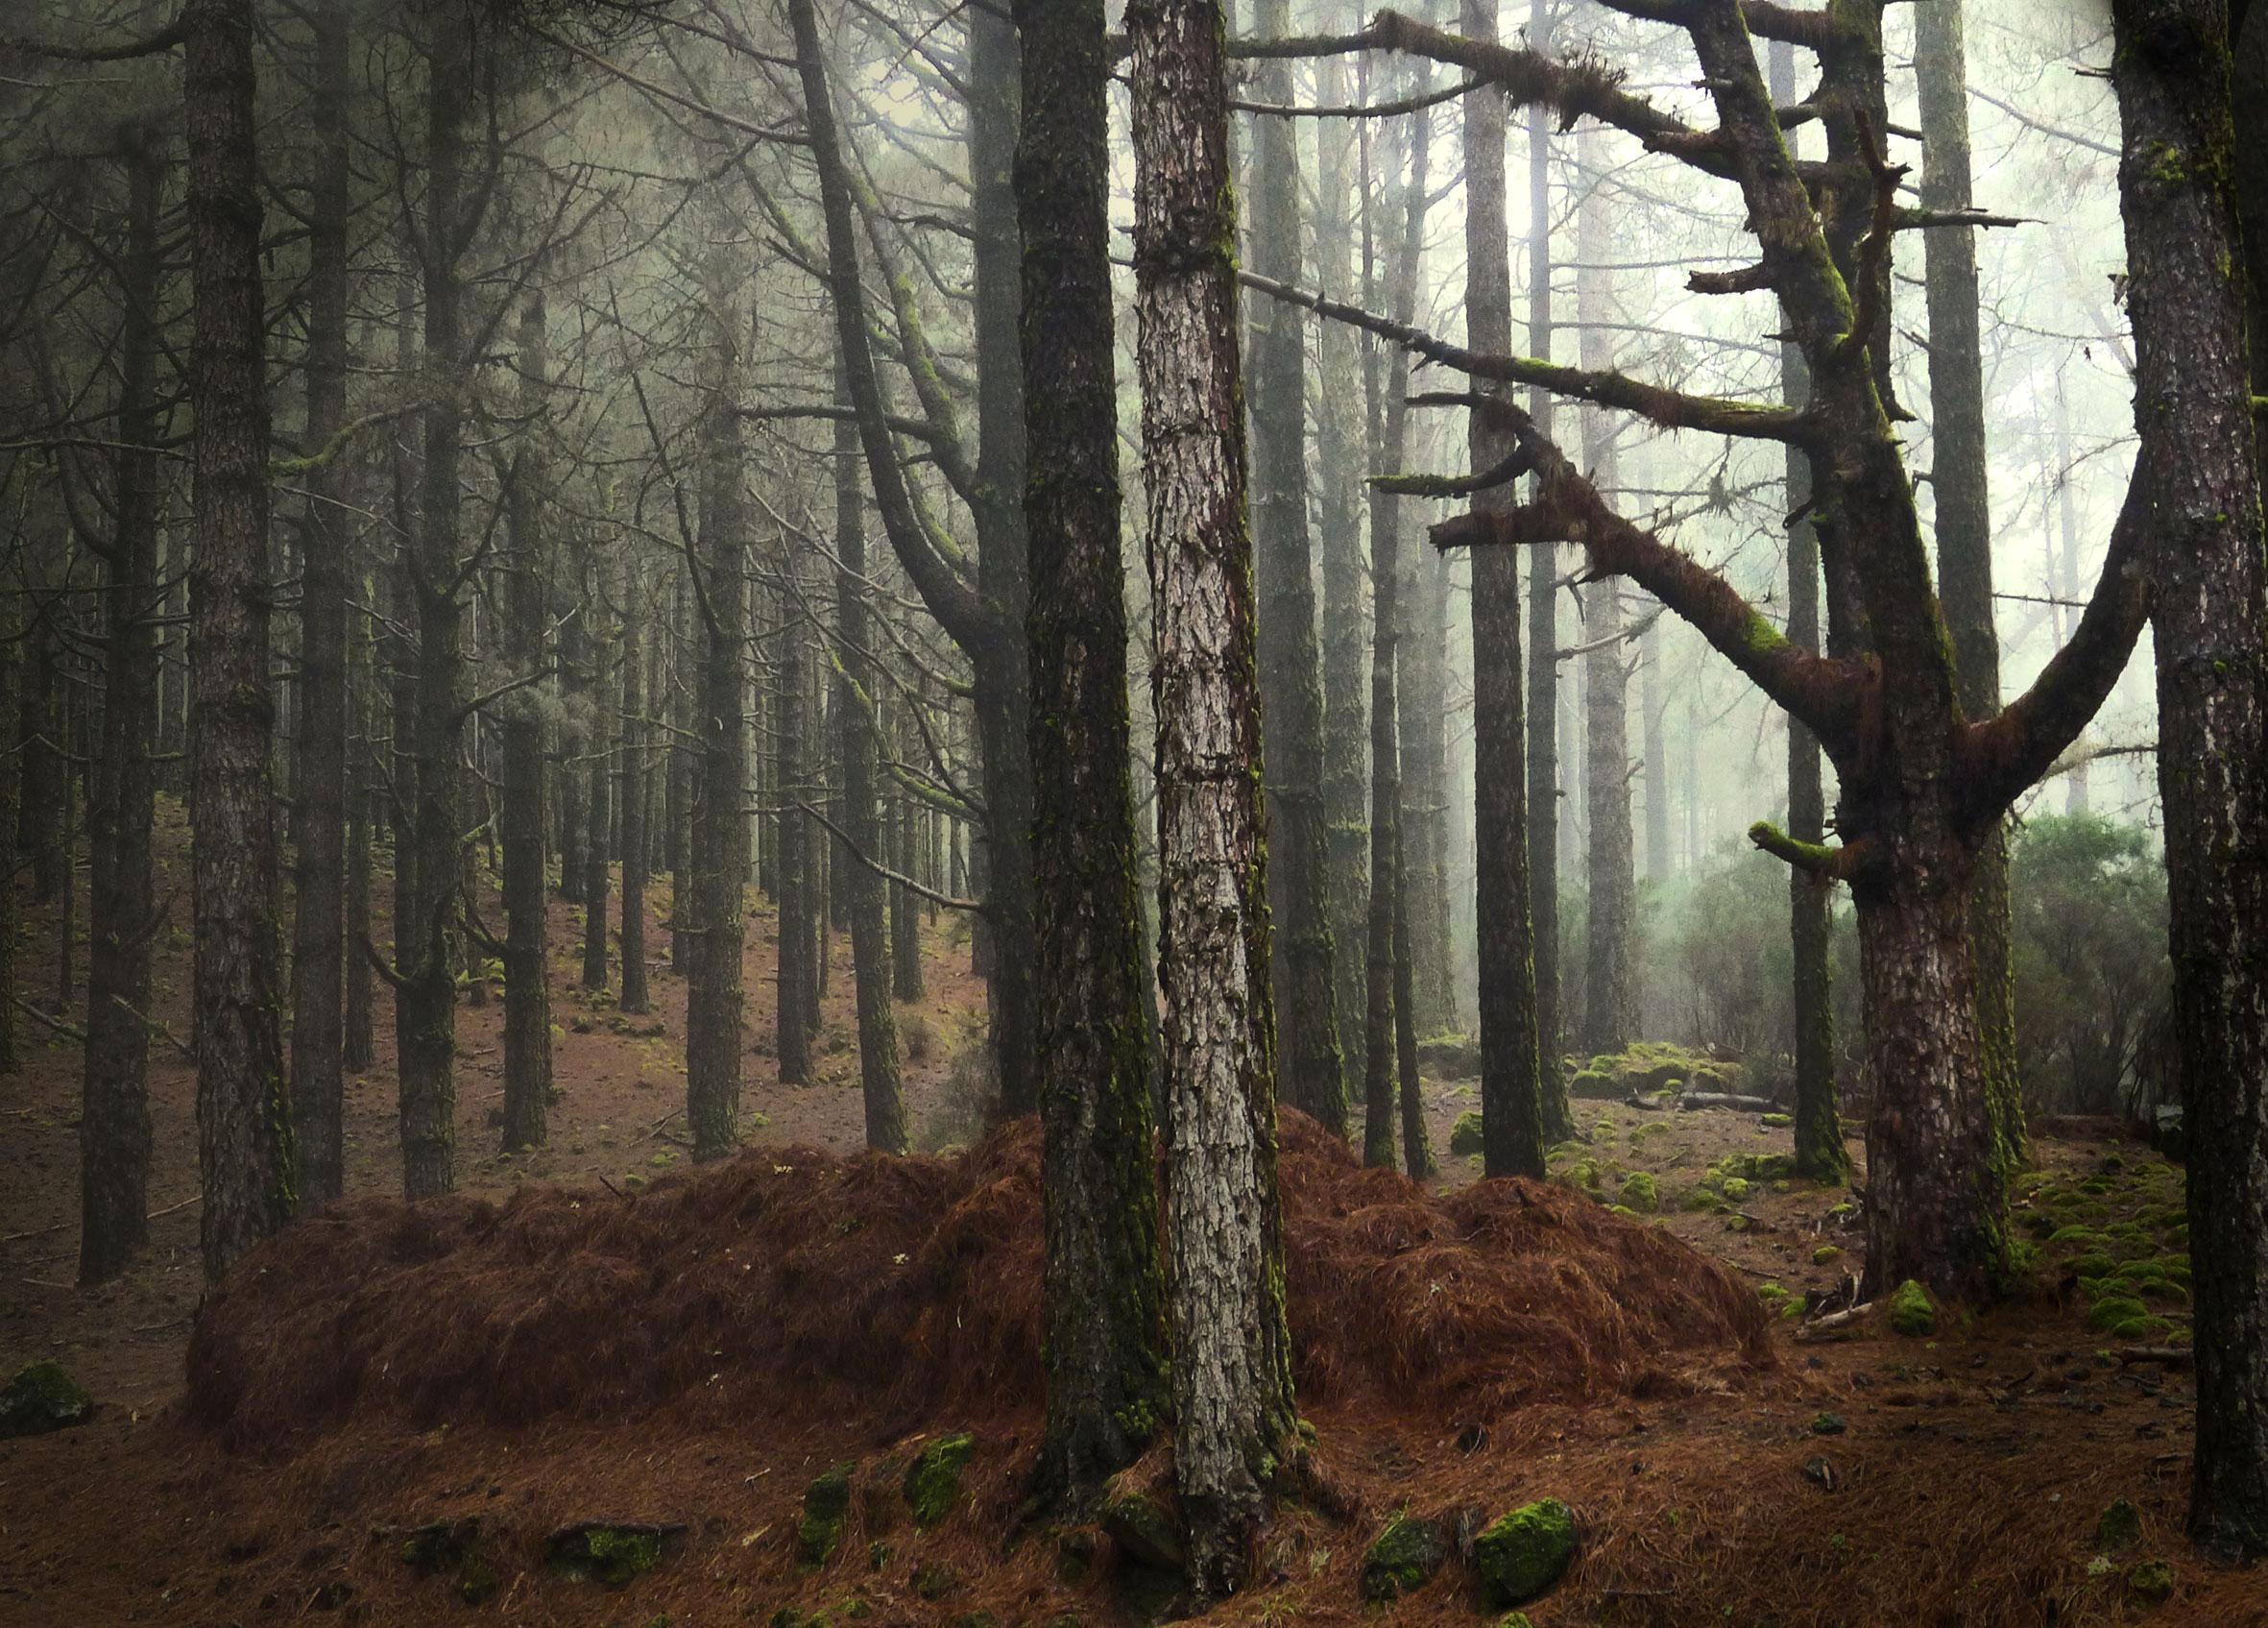 The woods, 2016. Digital print.